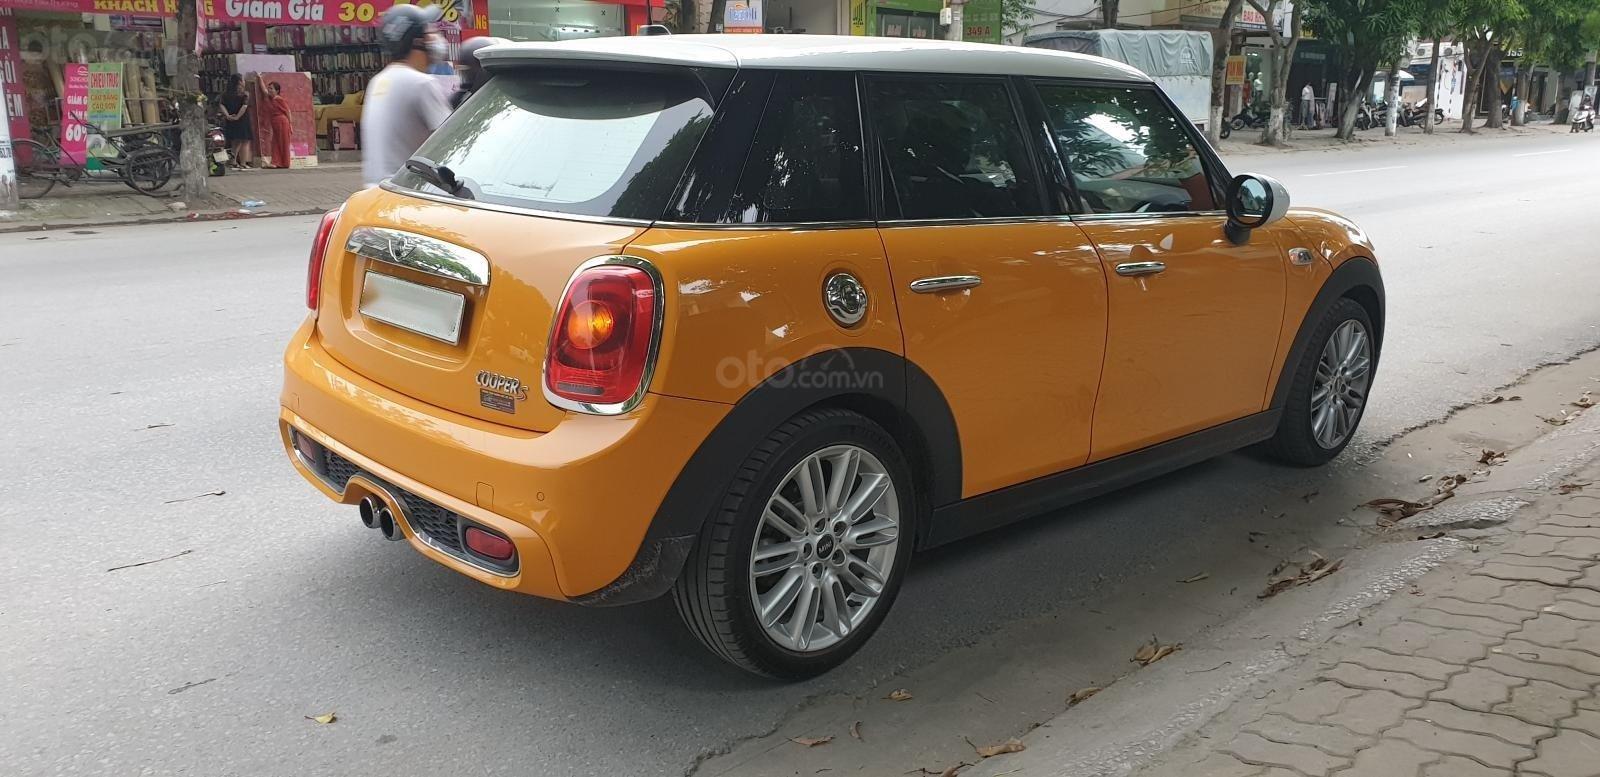 Bán Mini Cooper S model 2016 nhập khẩu-5